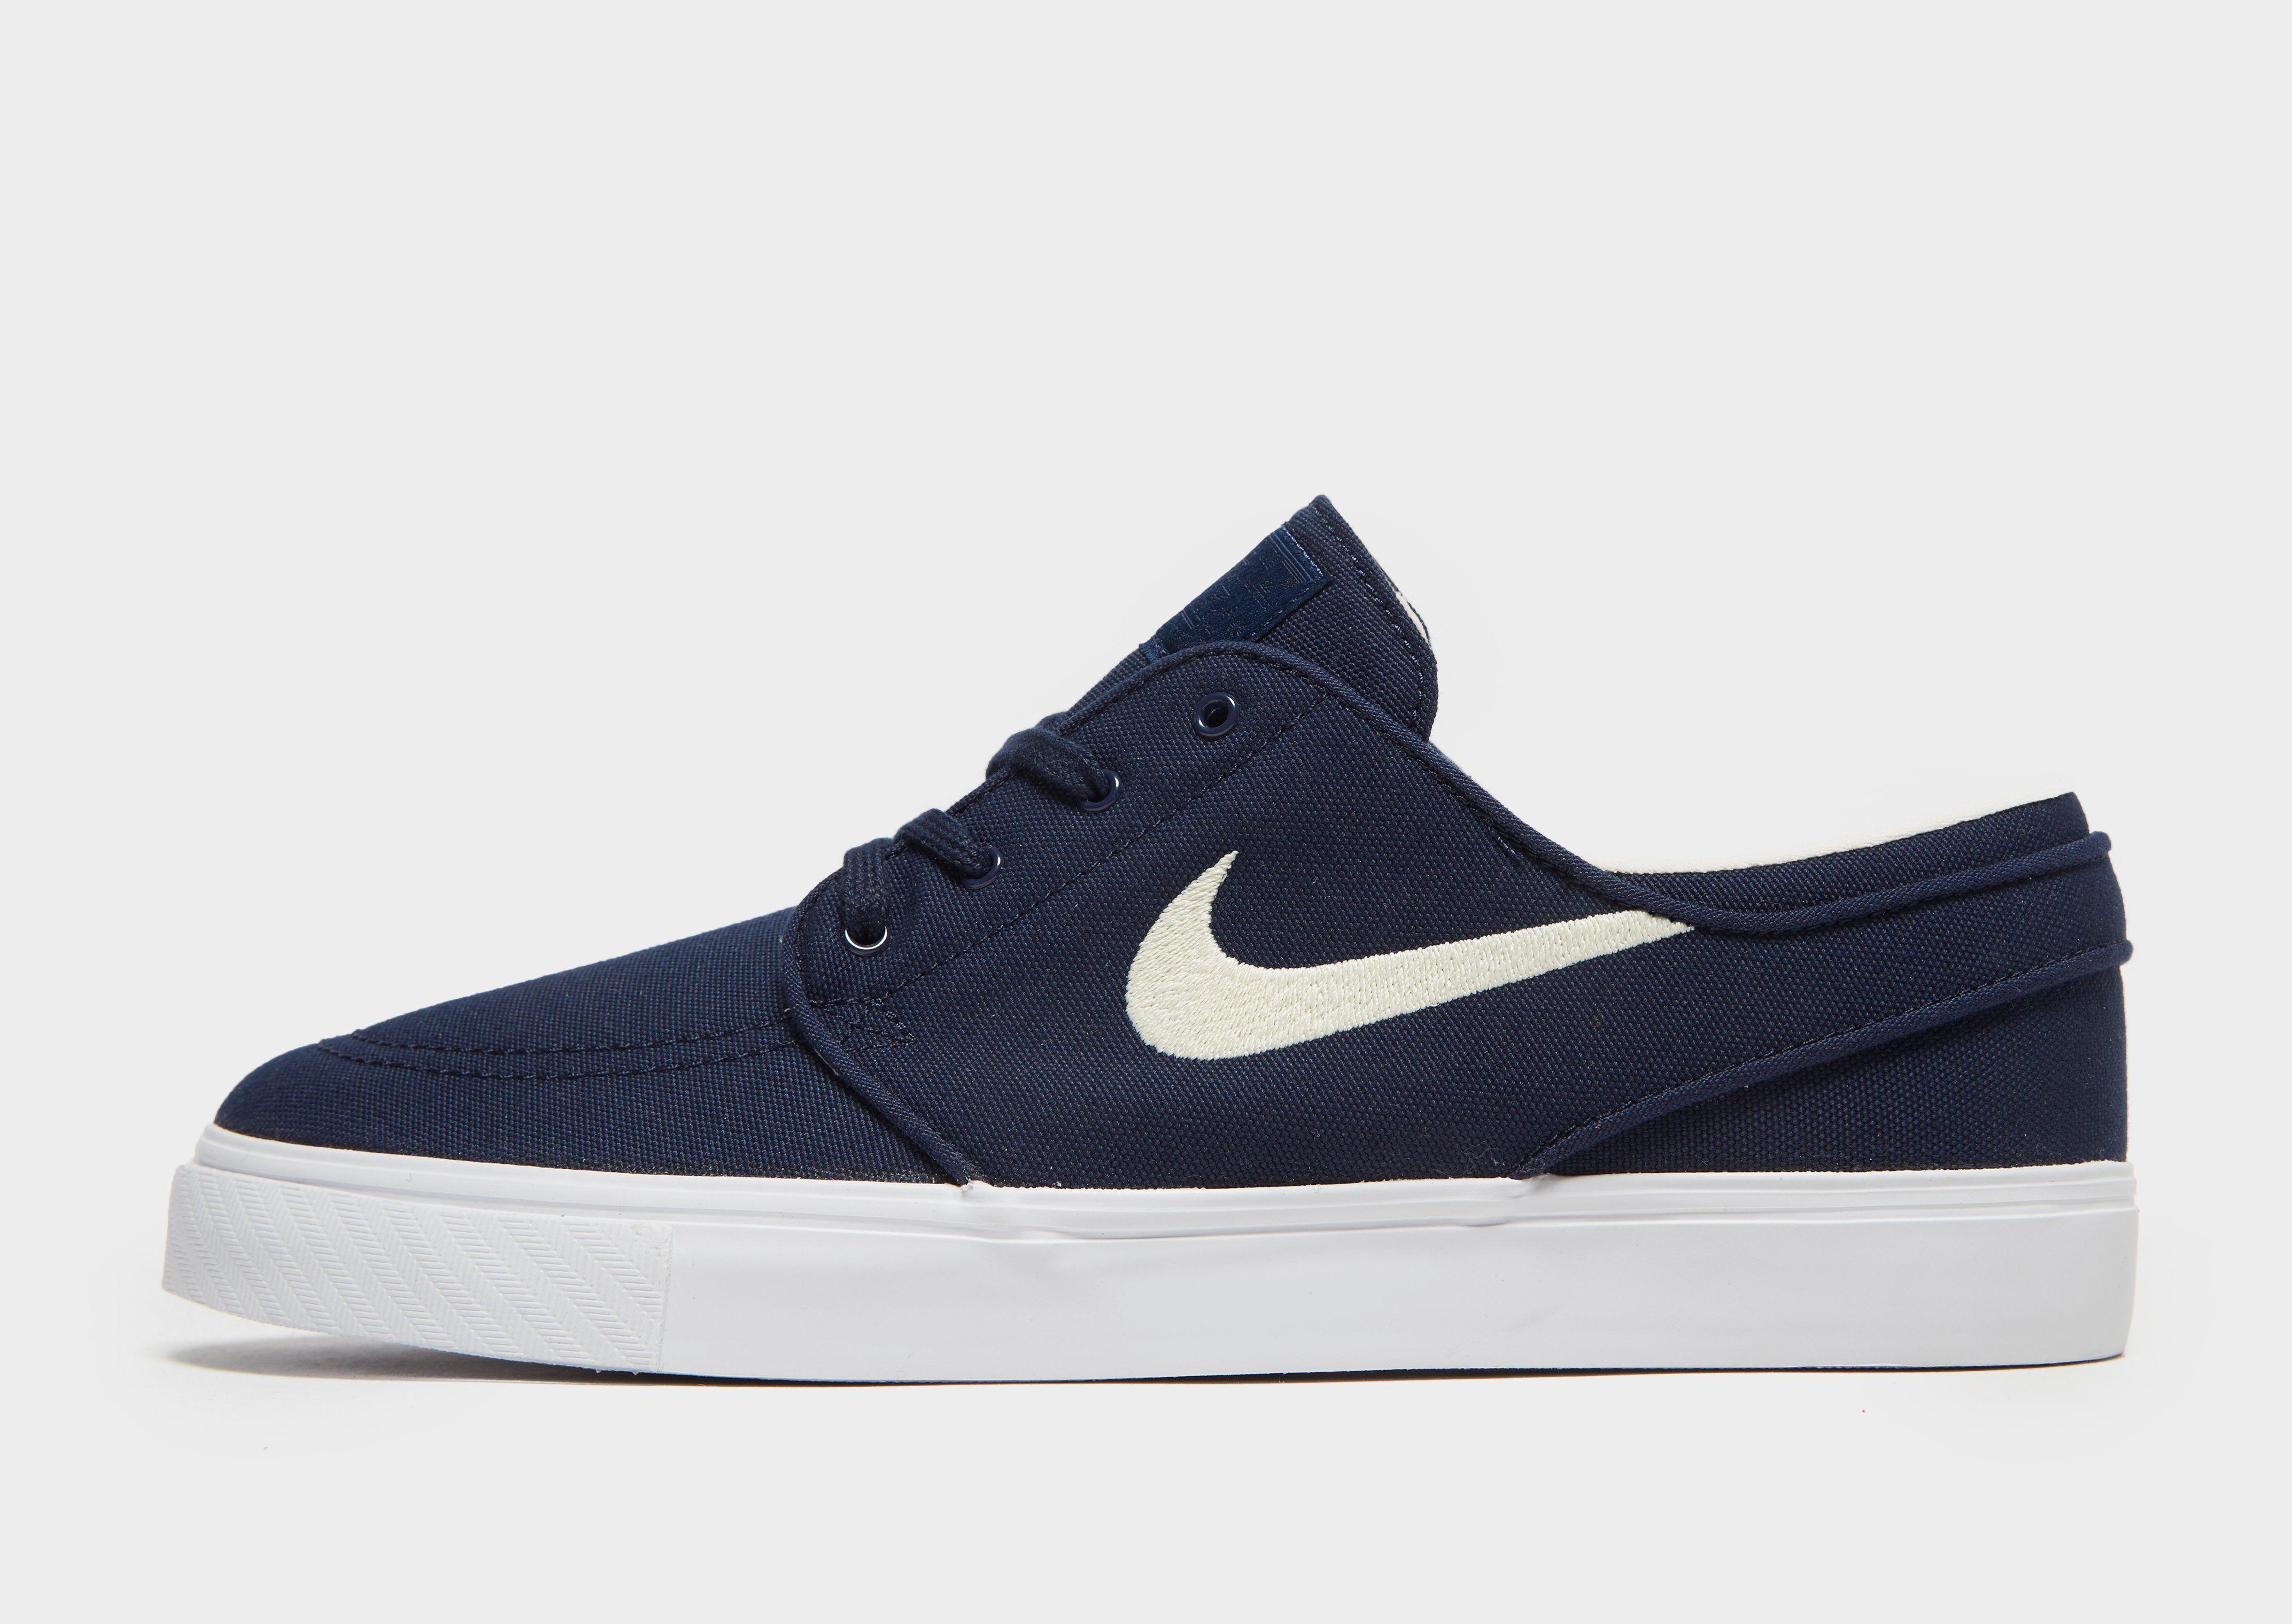 new product e3eb7 06199 Nike SB Zoom Stefan Janoski Canvas